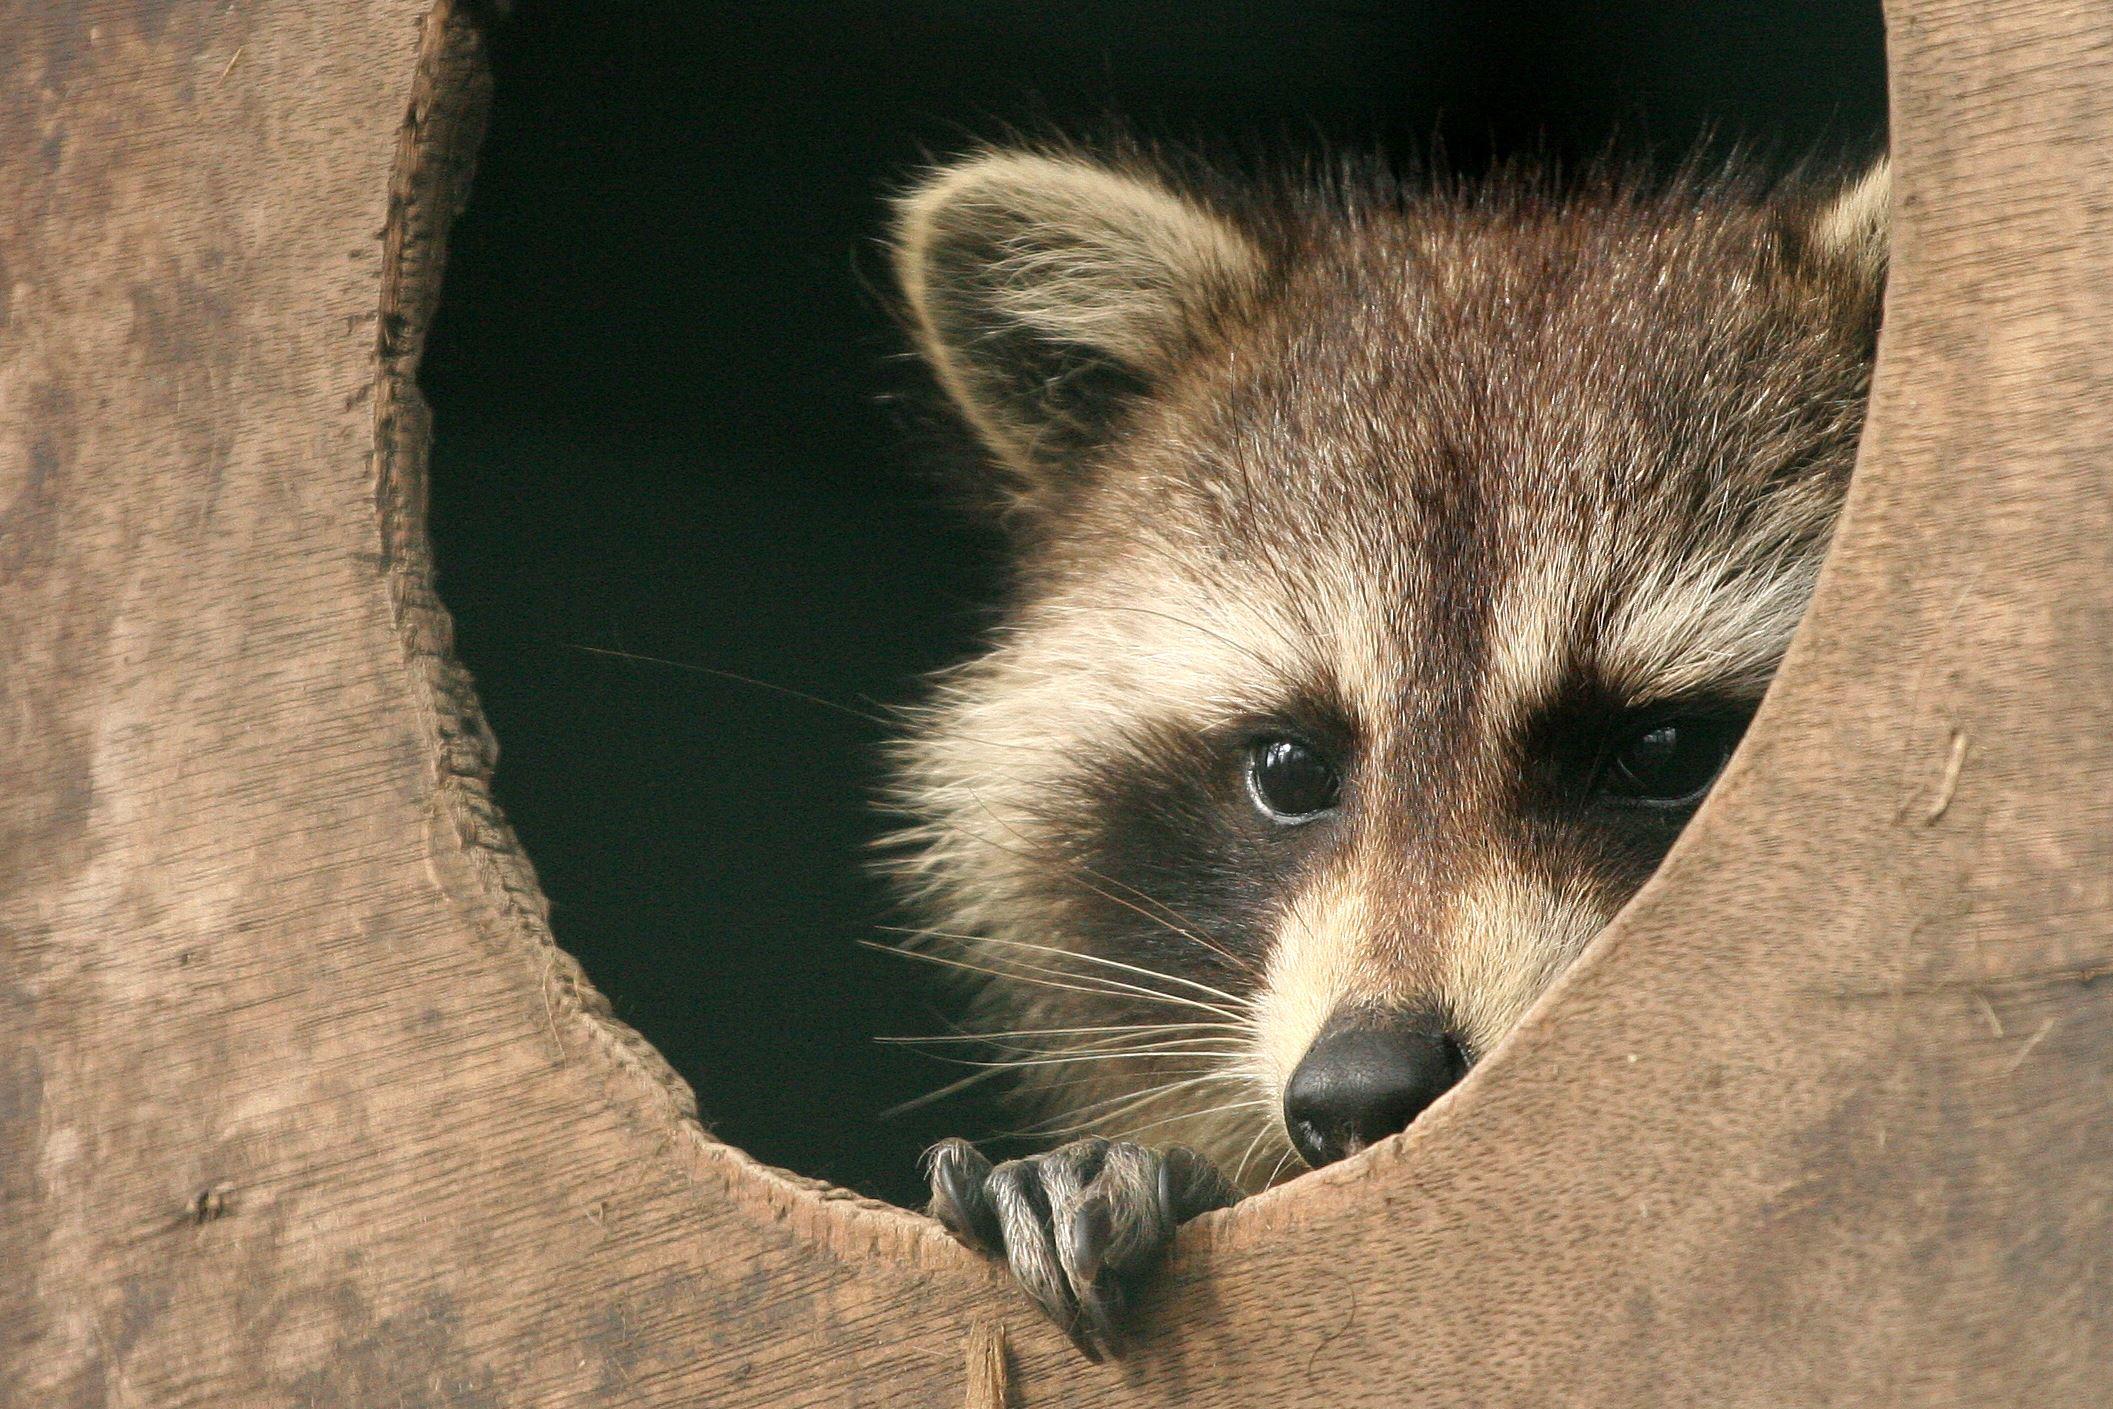 Rabid raccoon found in Millvale | Pittsburgh Post-Gazette Raccoon With Rabies